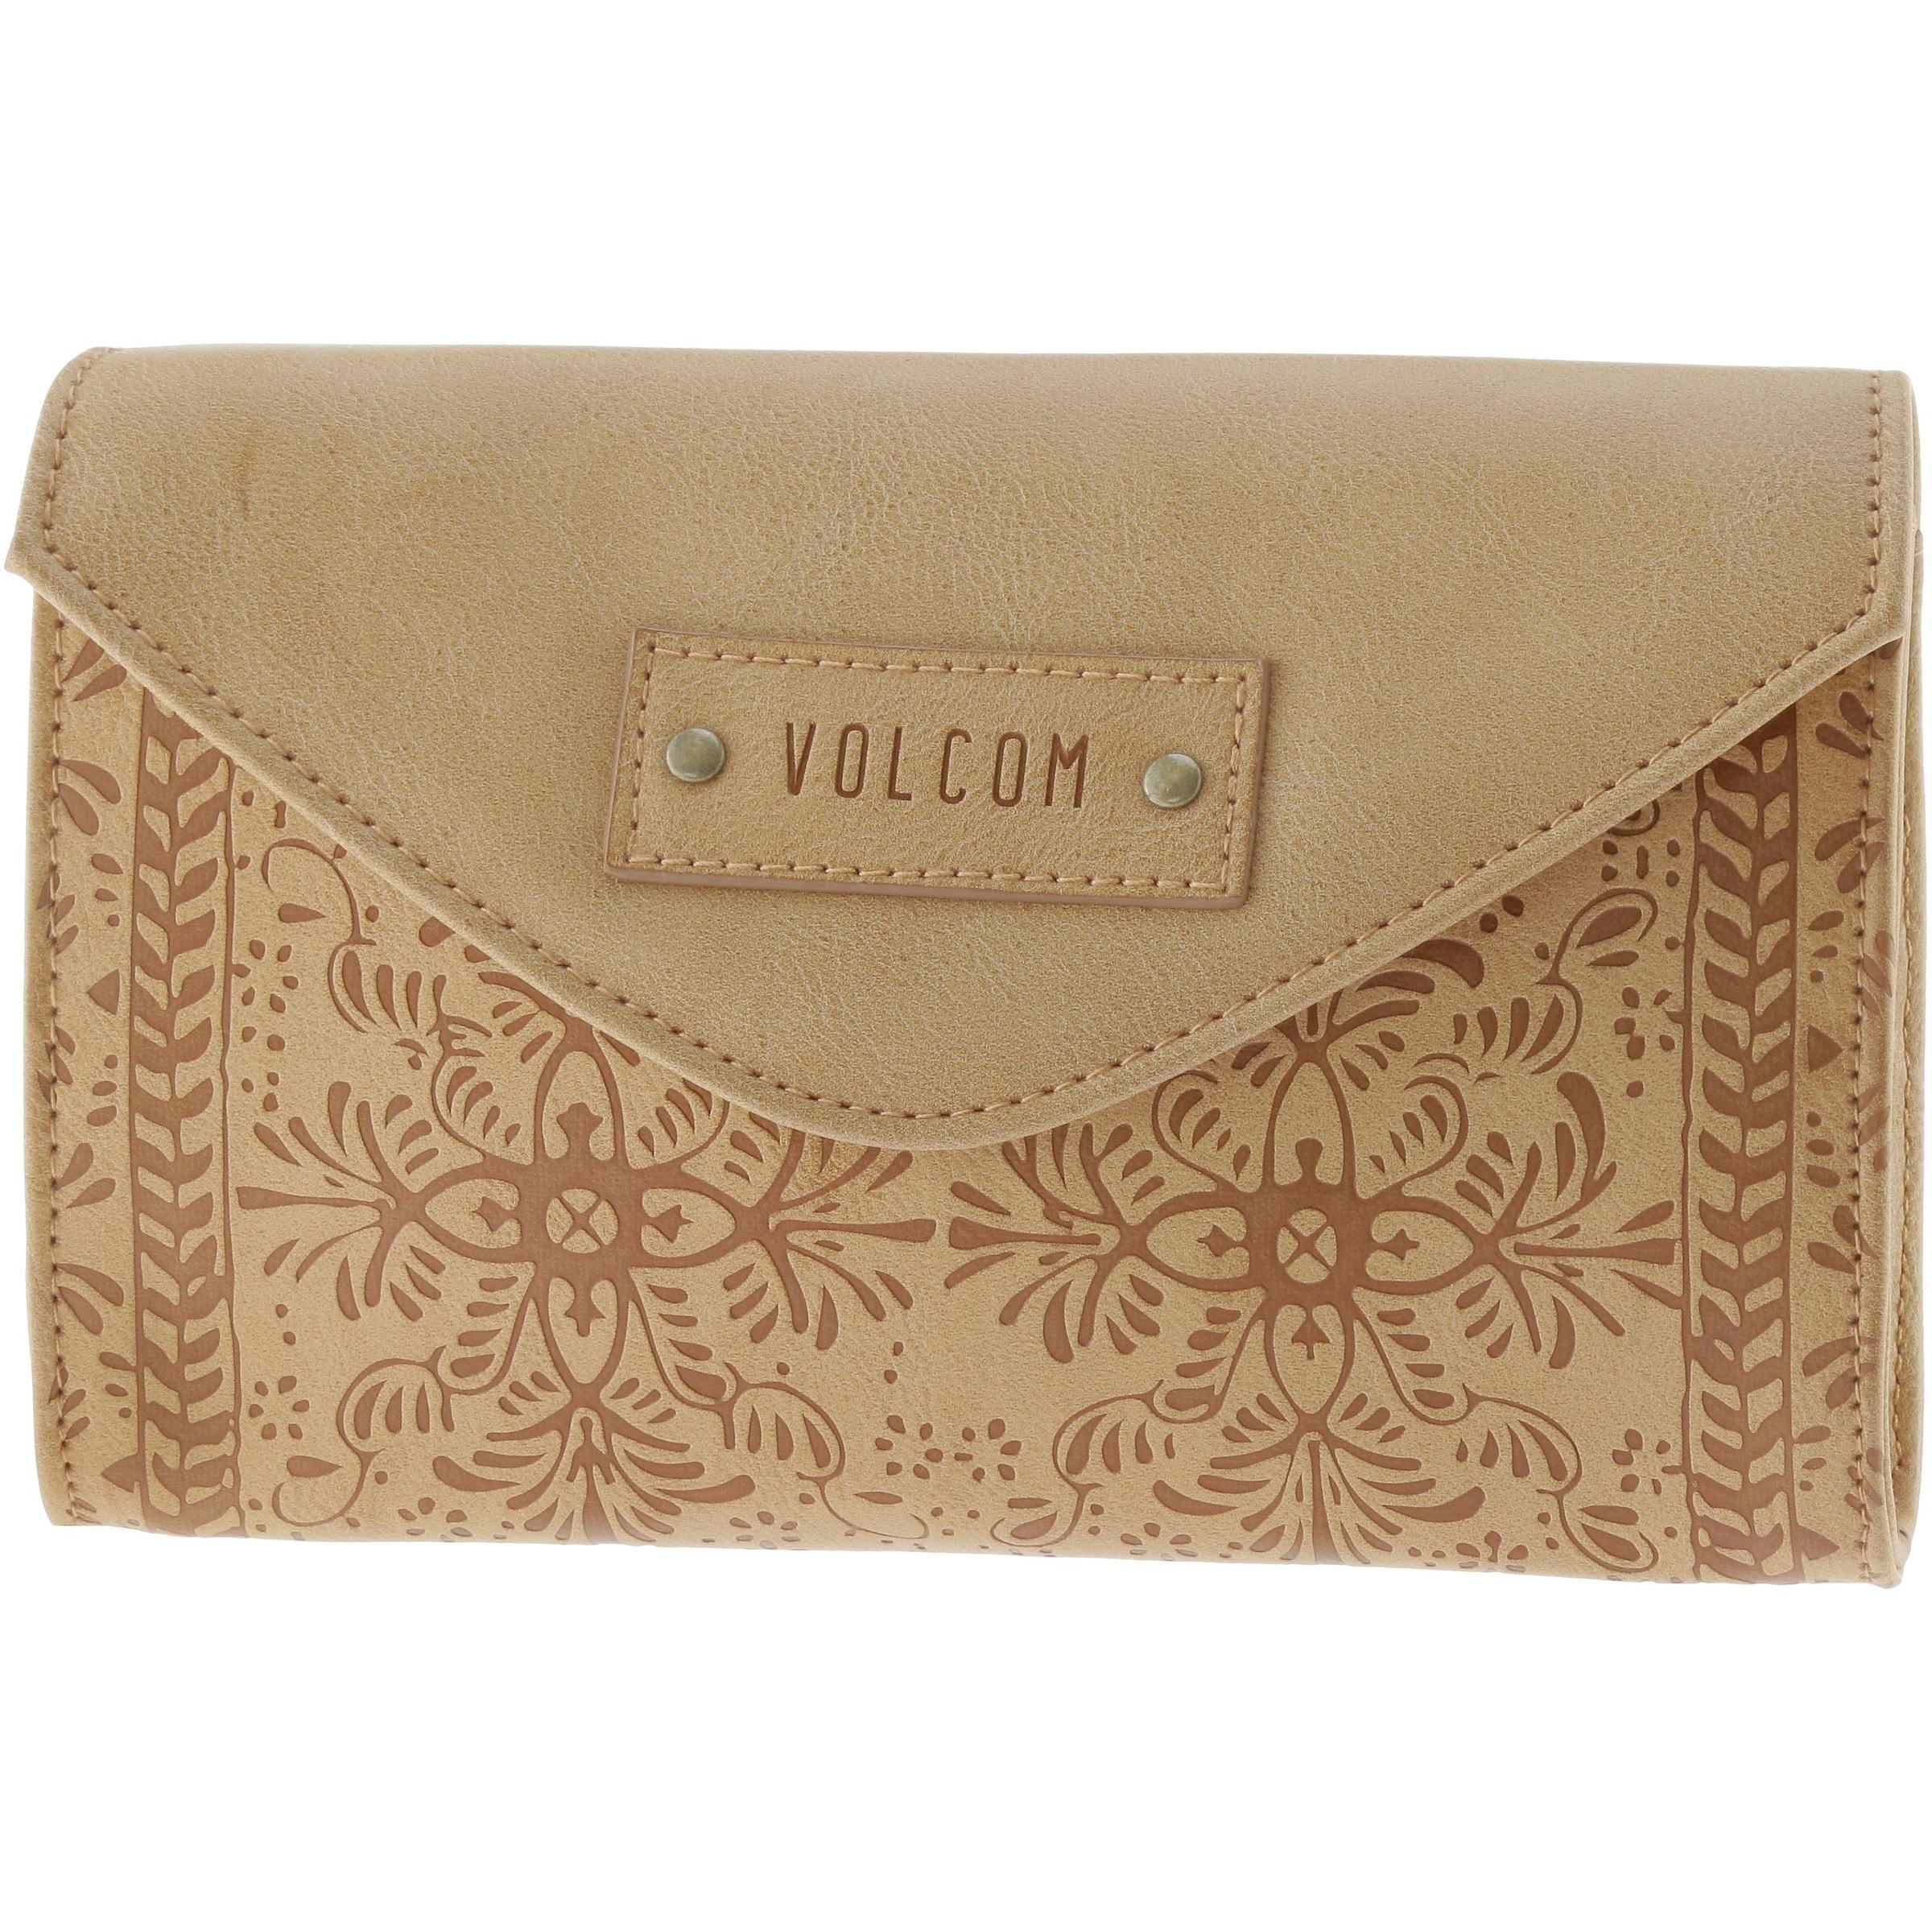 Volcom ' DEZERT MIST' Handtasche Damen Exklusiv Frei Verschiffen Angebot PKCT6duiAA